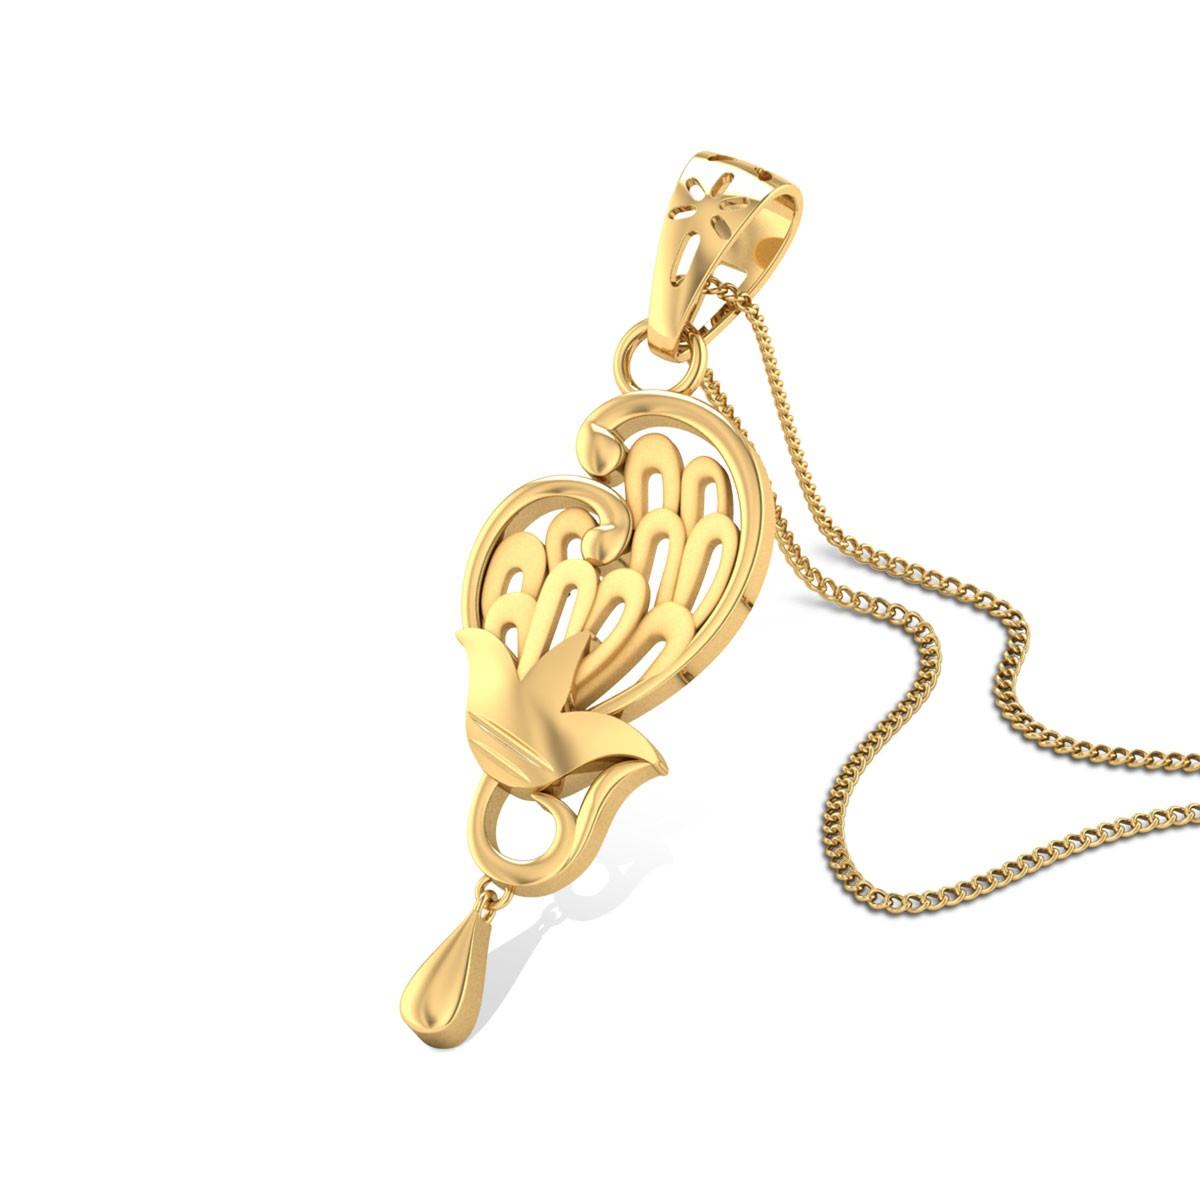 Buy Augusta Gold Pendant in 2.81 Grams Gold Online